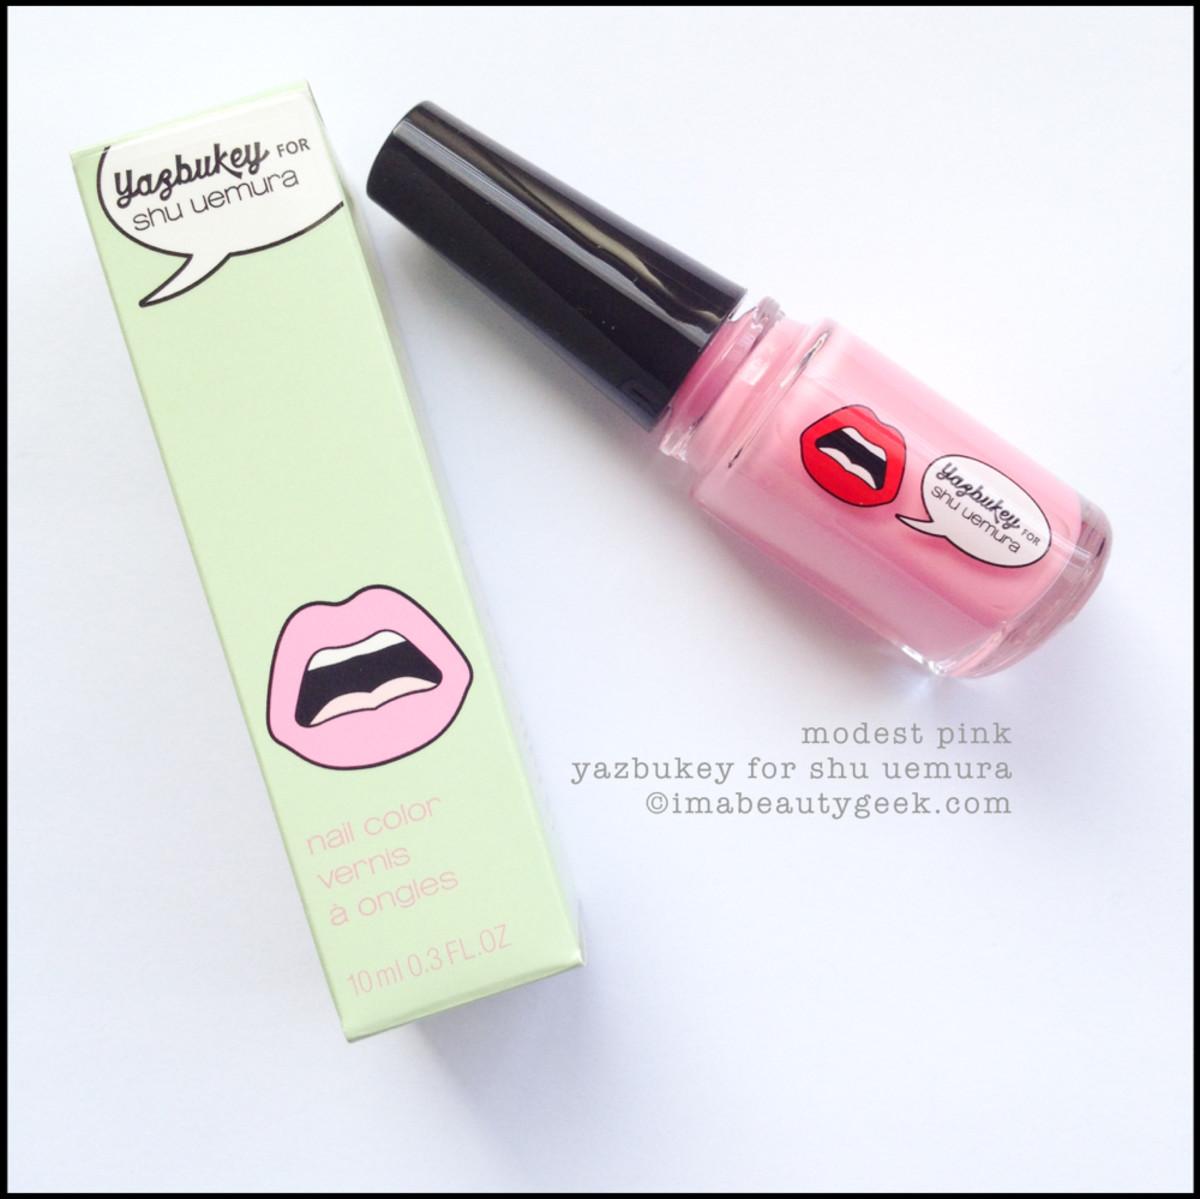 Yazbukey for Shu Uemura Nail Polish Modest Pink Swatch 2015